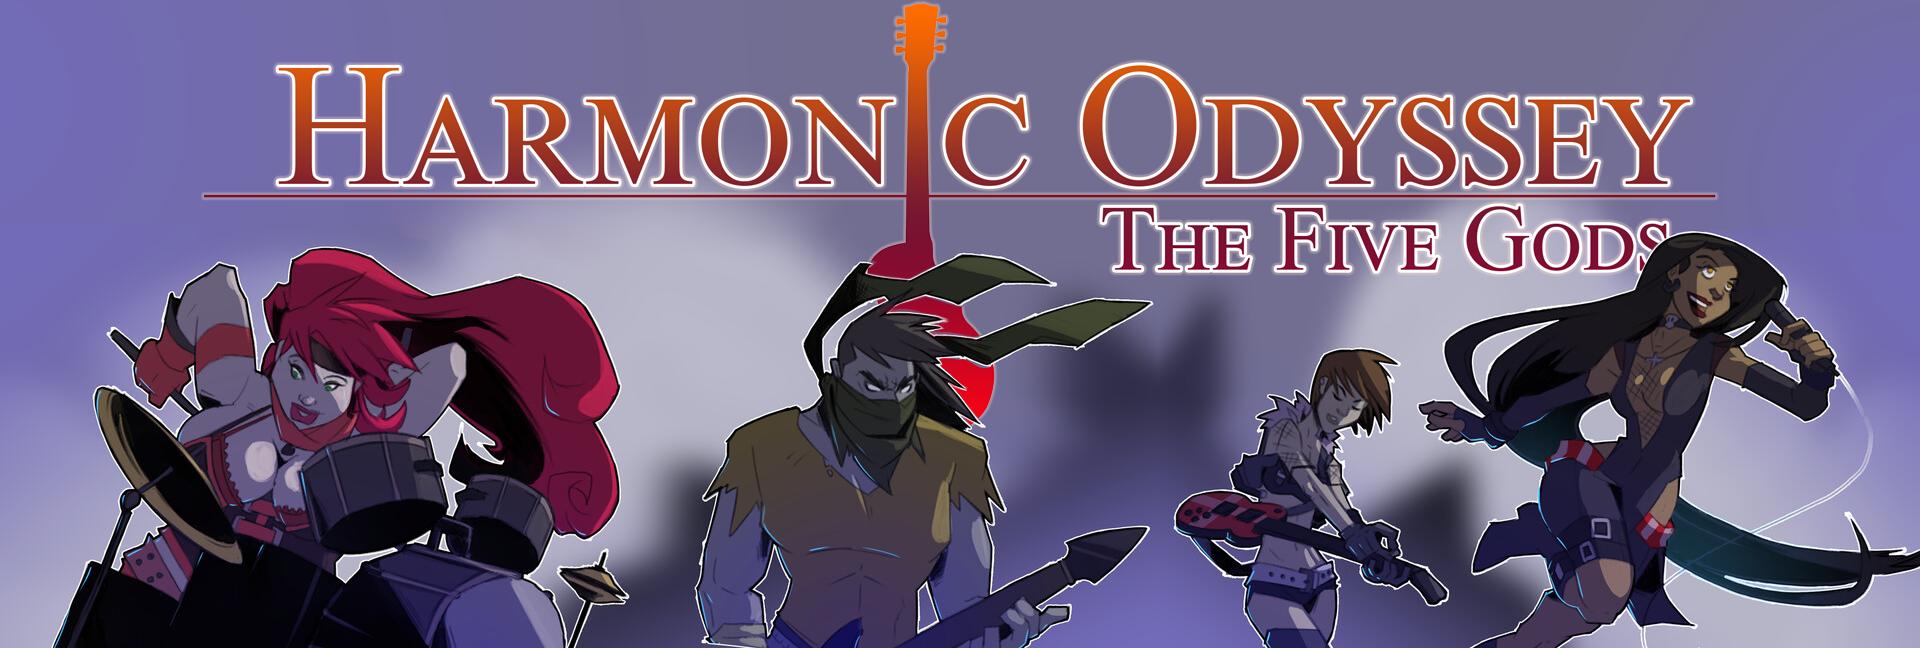 Harmonic Odyssey: The Five Gods